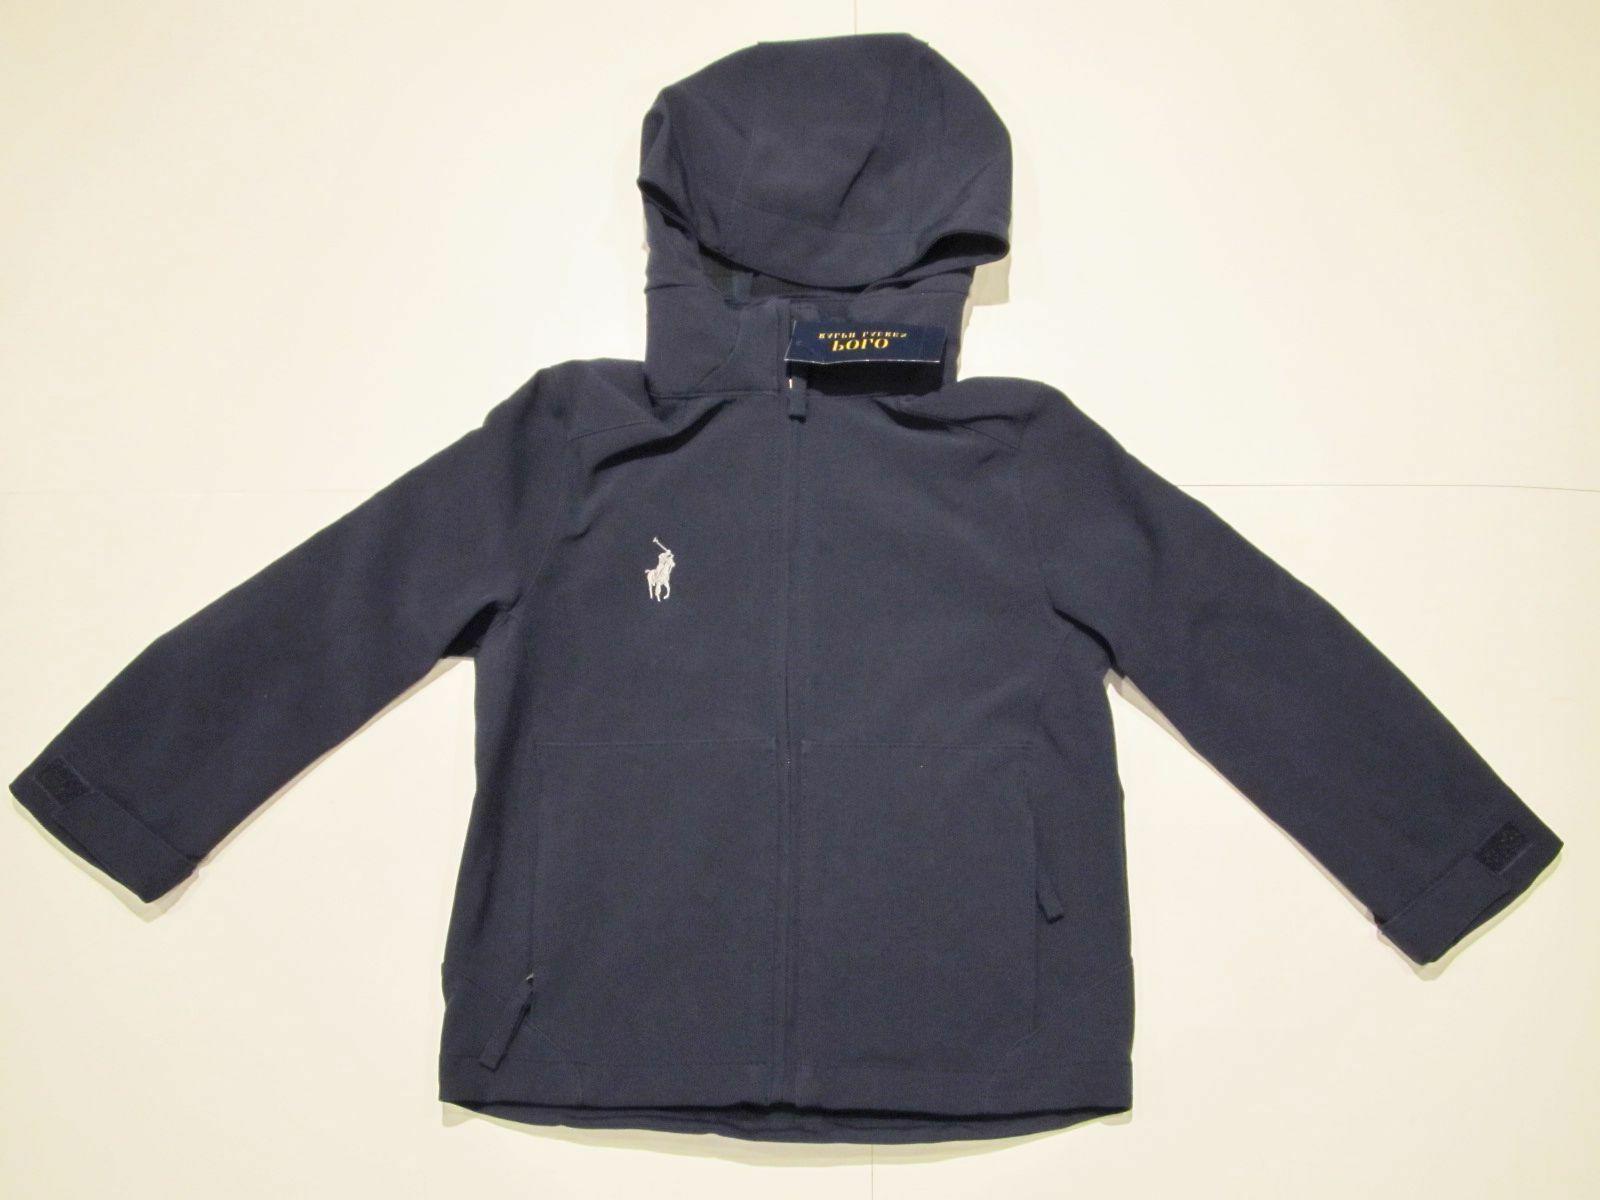 new tag boys polo navy blue hooded